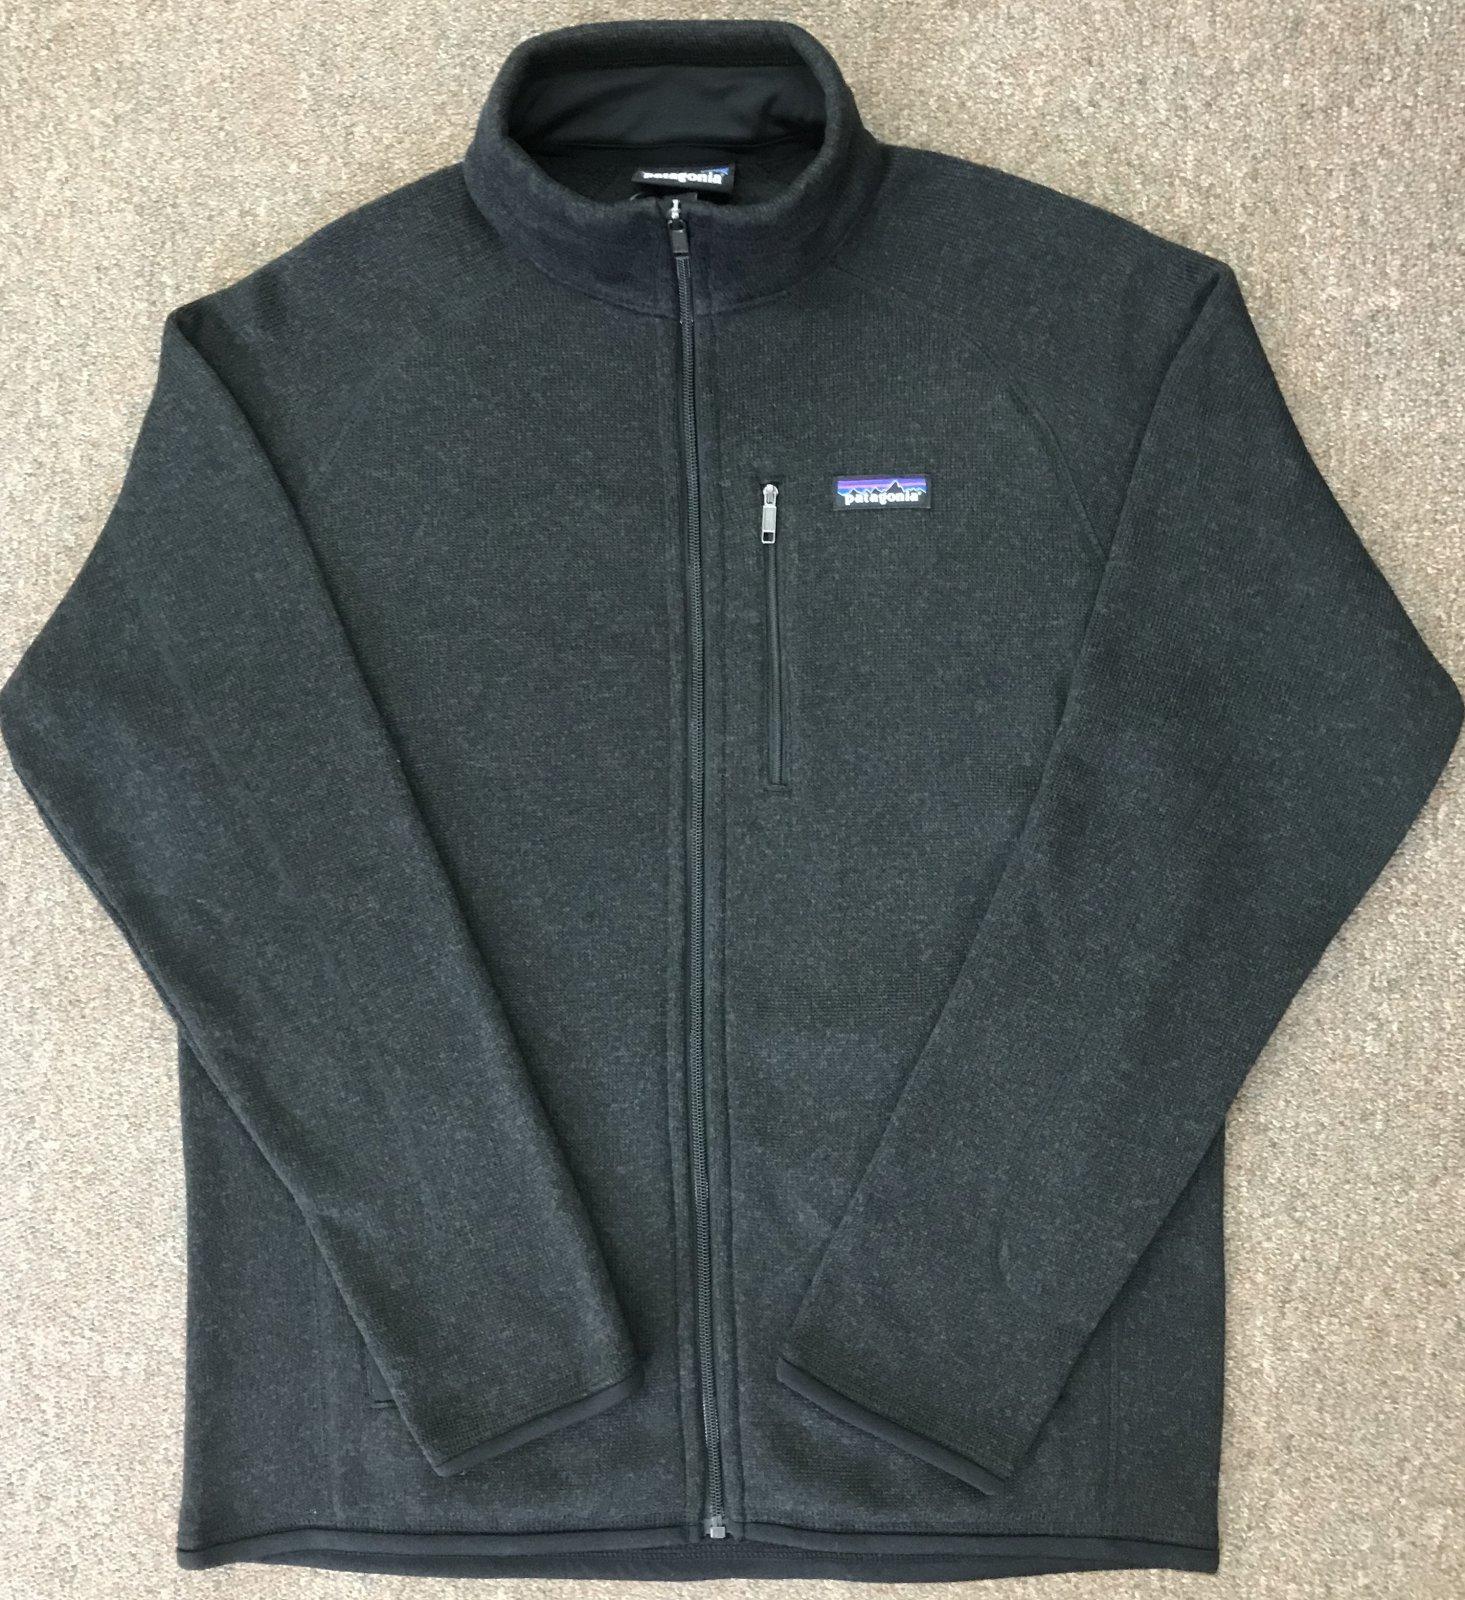 Patagonia Men's Better Sweater Full Zip Jkt